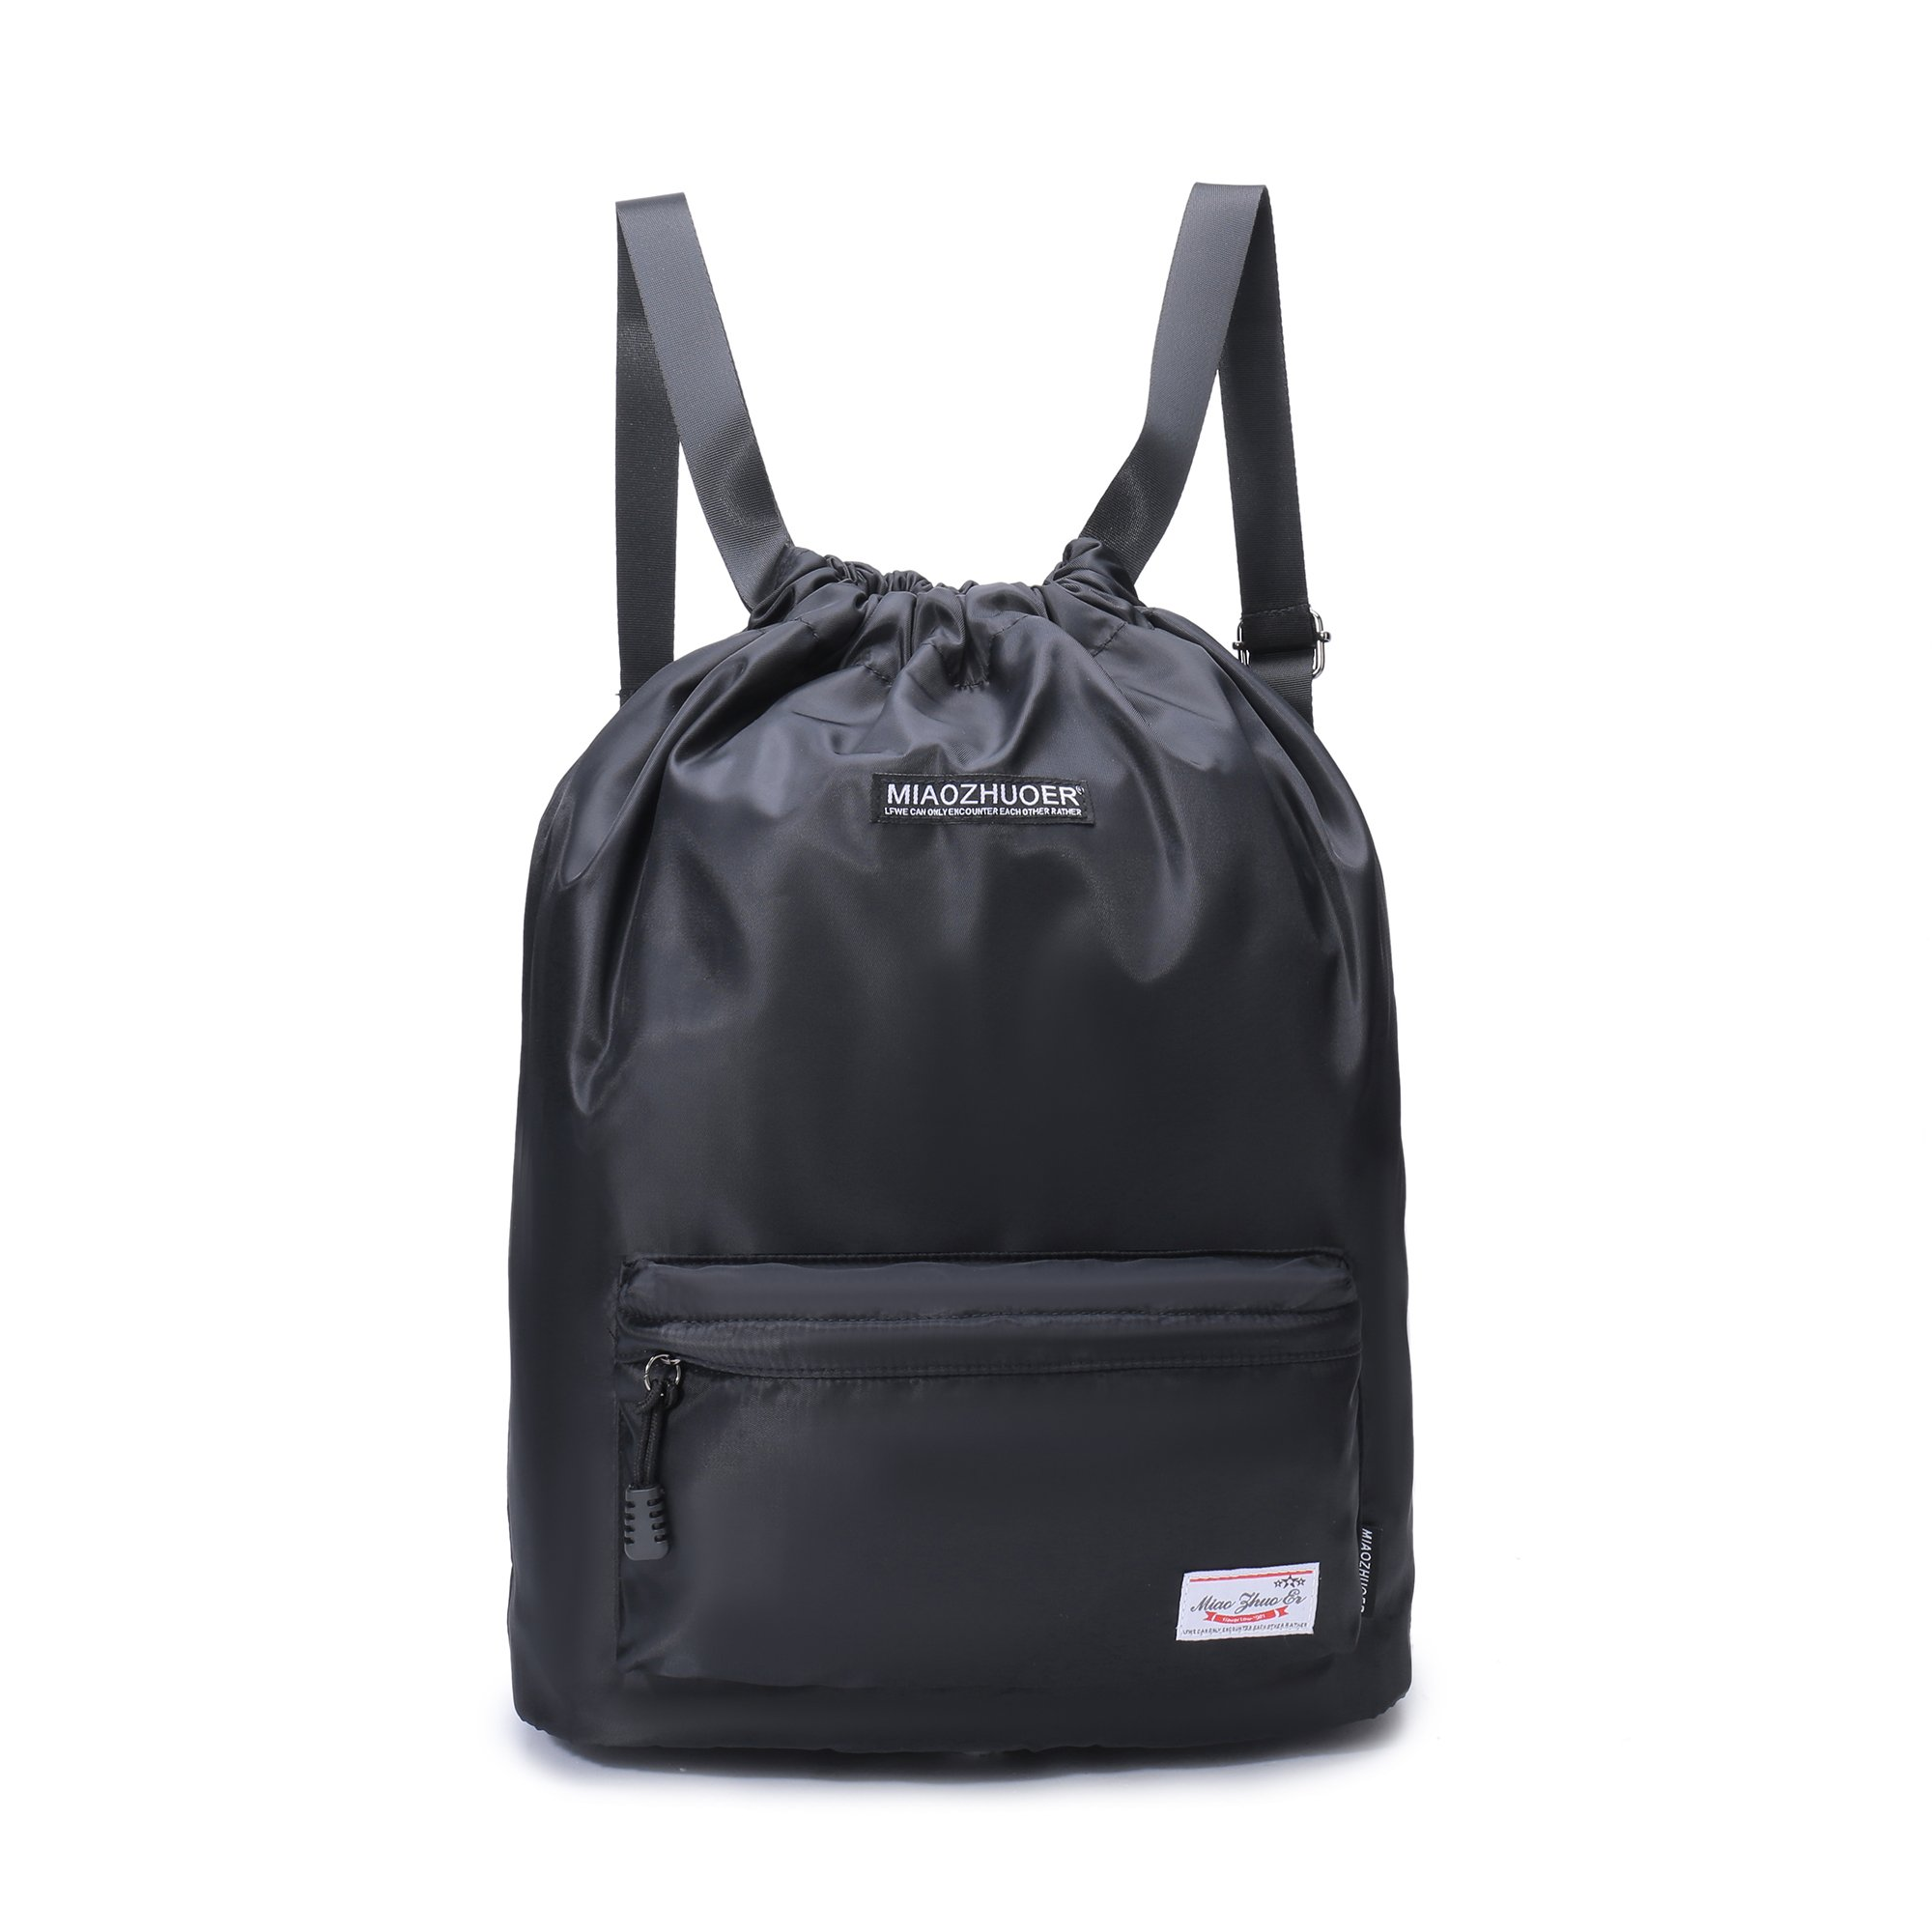 Yinjue Sport GymSack Cinch Sack Drawstring Backpack For Men&Women Kids, Lightweight Foldable Travel Hiking Yoga Summer Swimming Dancer Bags (Black44)